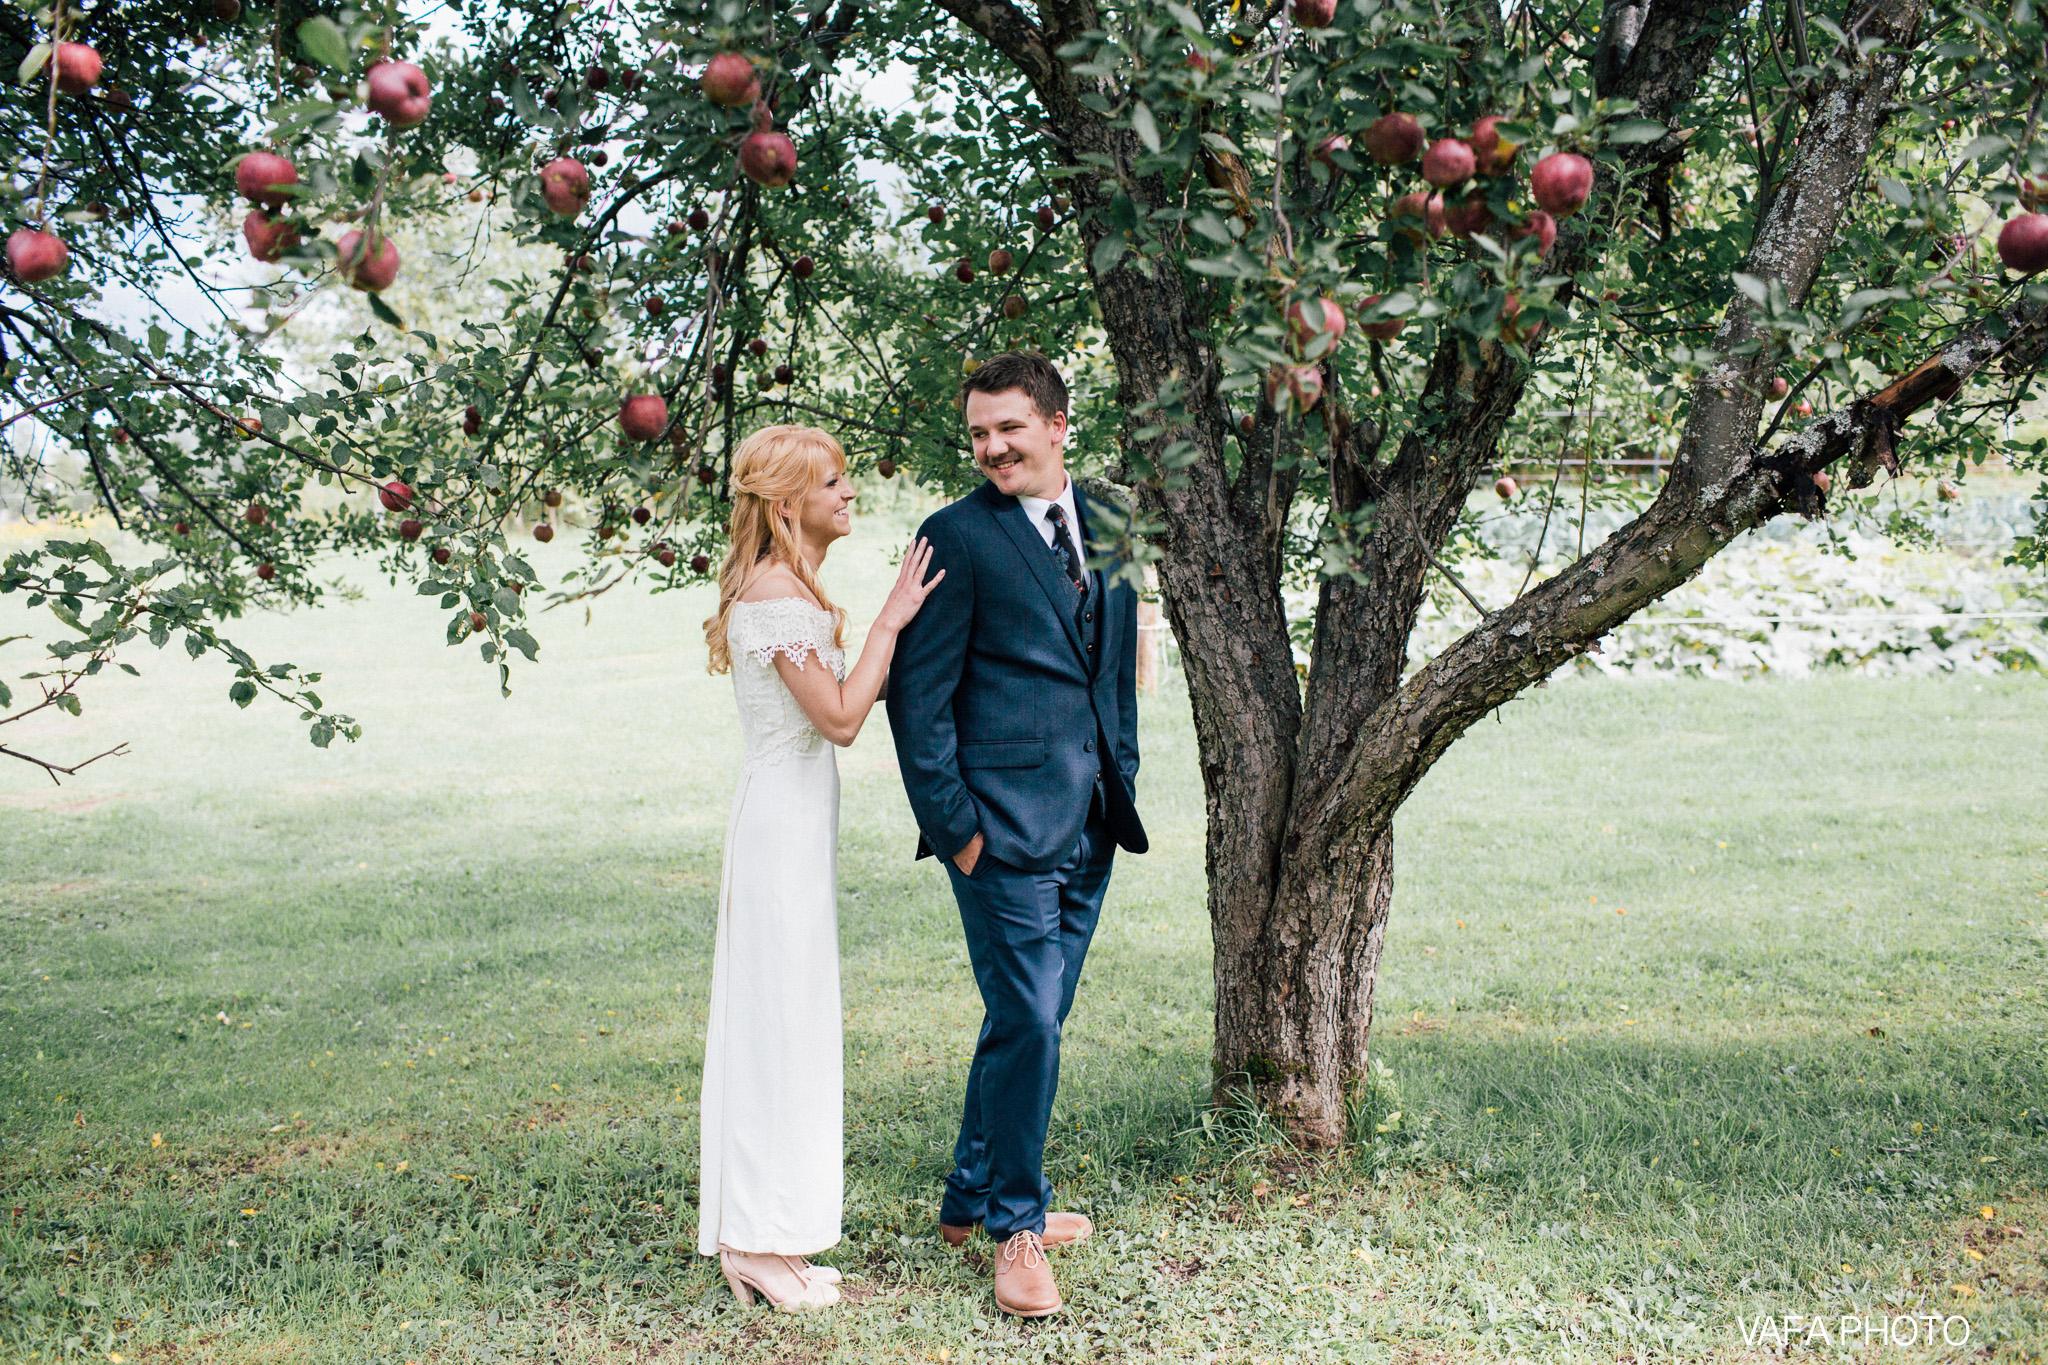 Belsolda-Farm-Wedding-Christy-Eric-Vafa-Photo-36.jpg